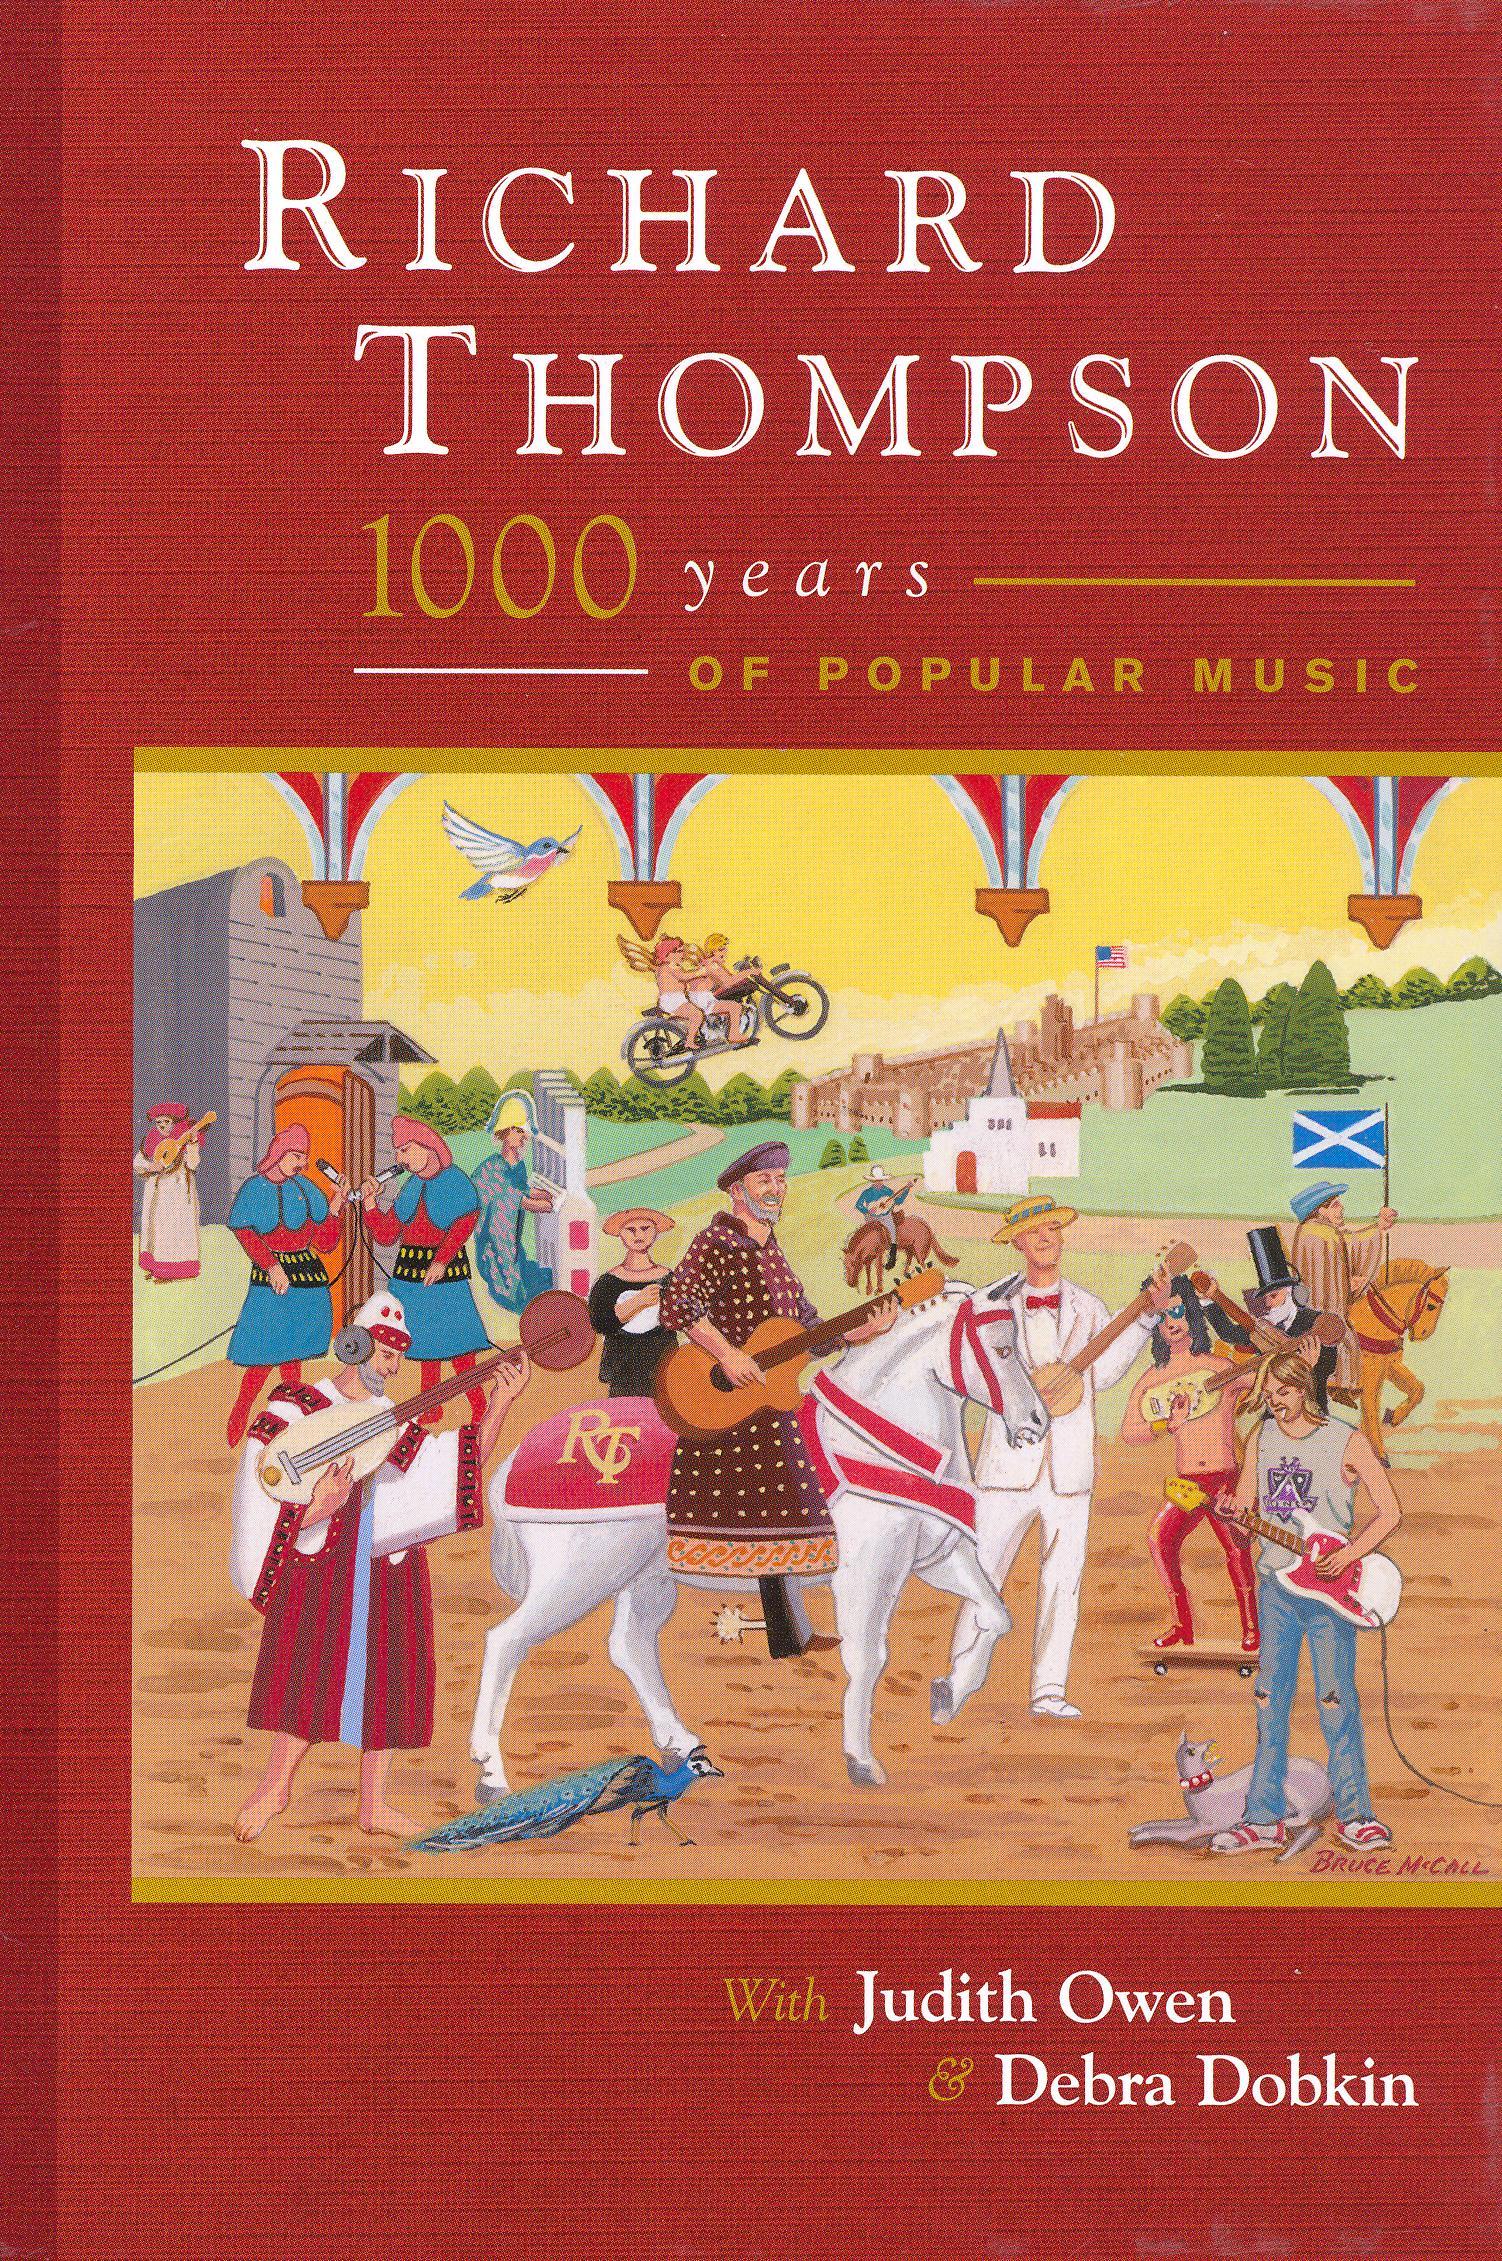 Richard Thompson: 1000 Years of Popular Music